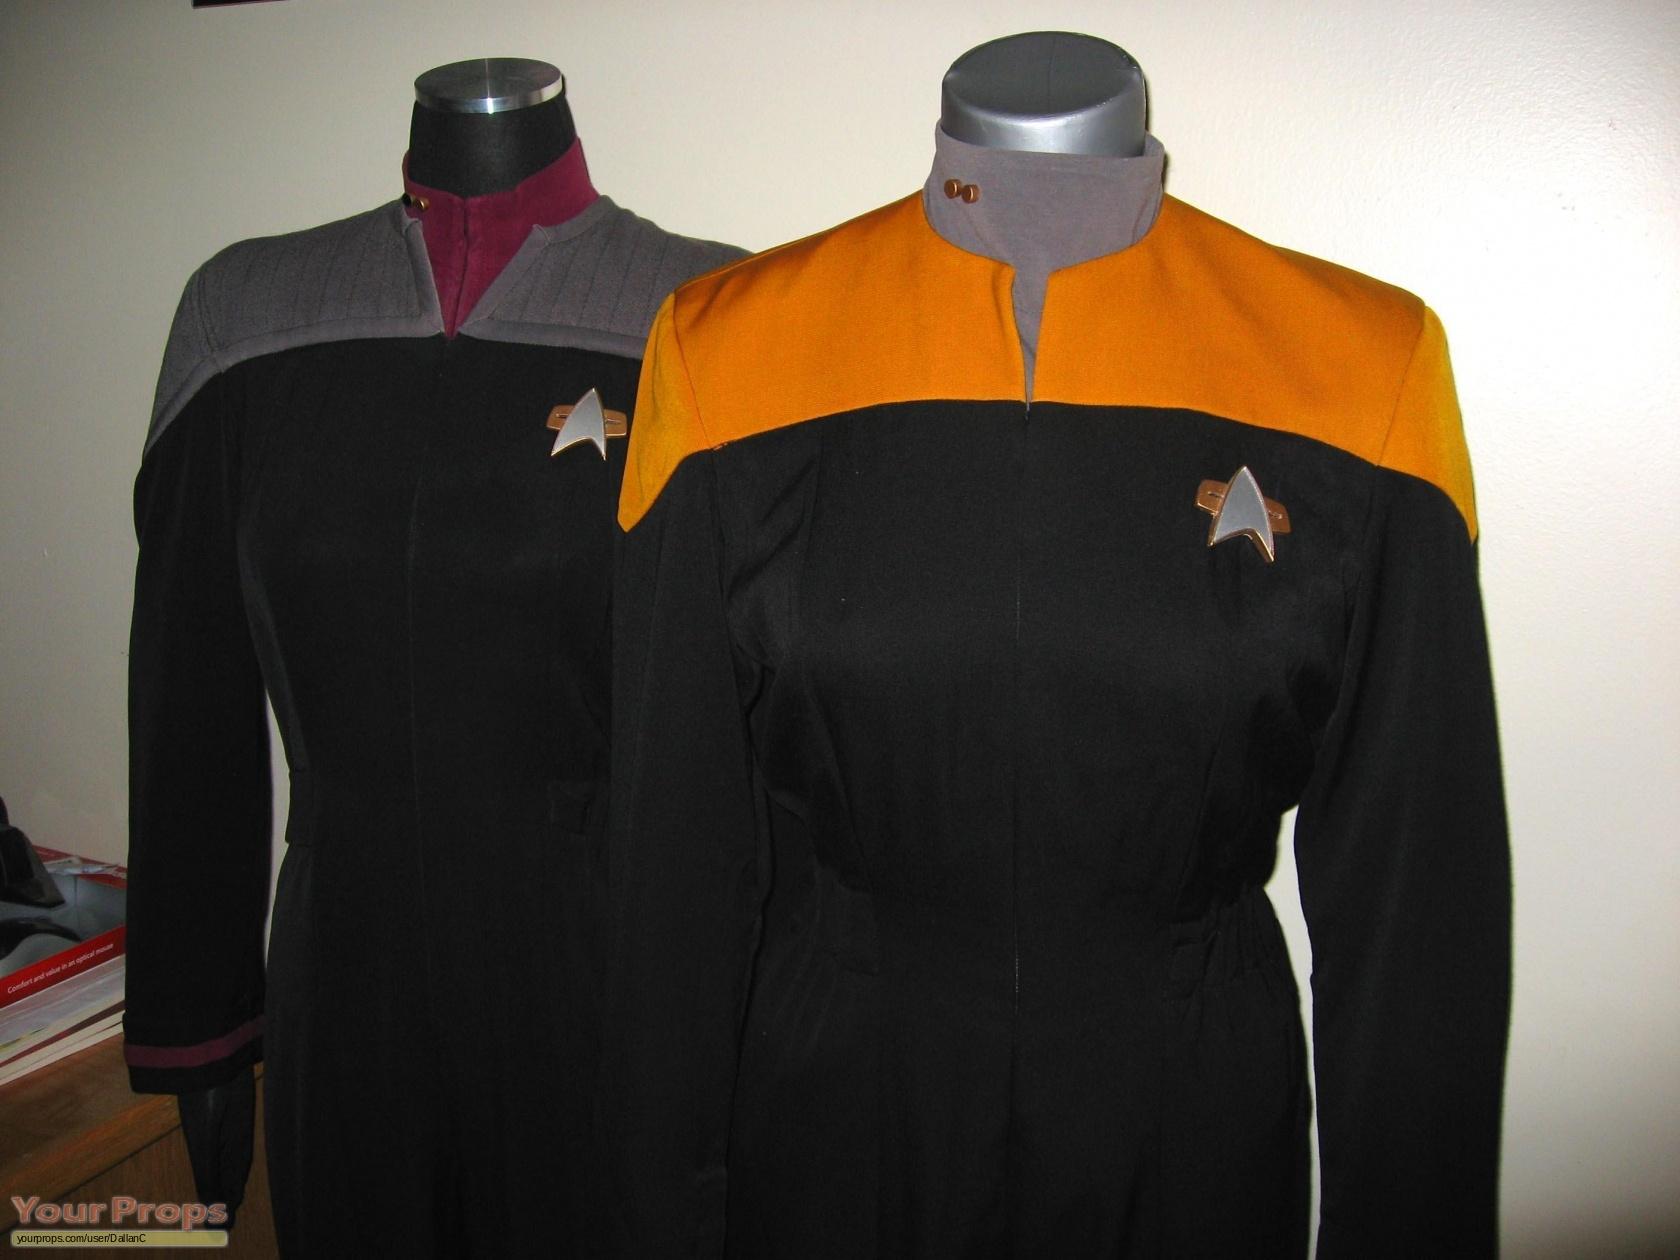 Star Trek Voyager Costumes 37